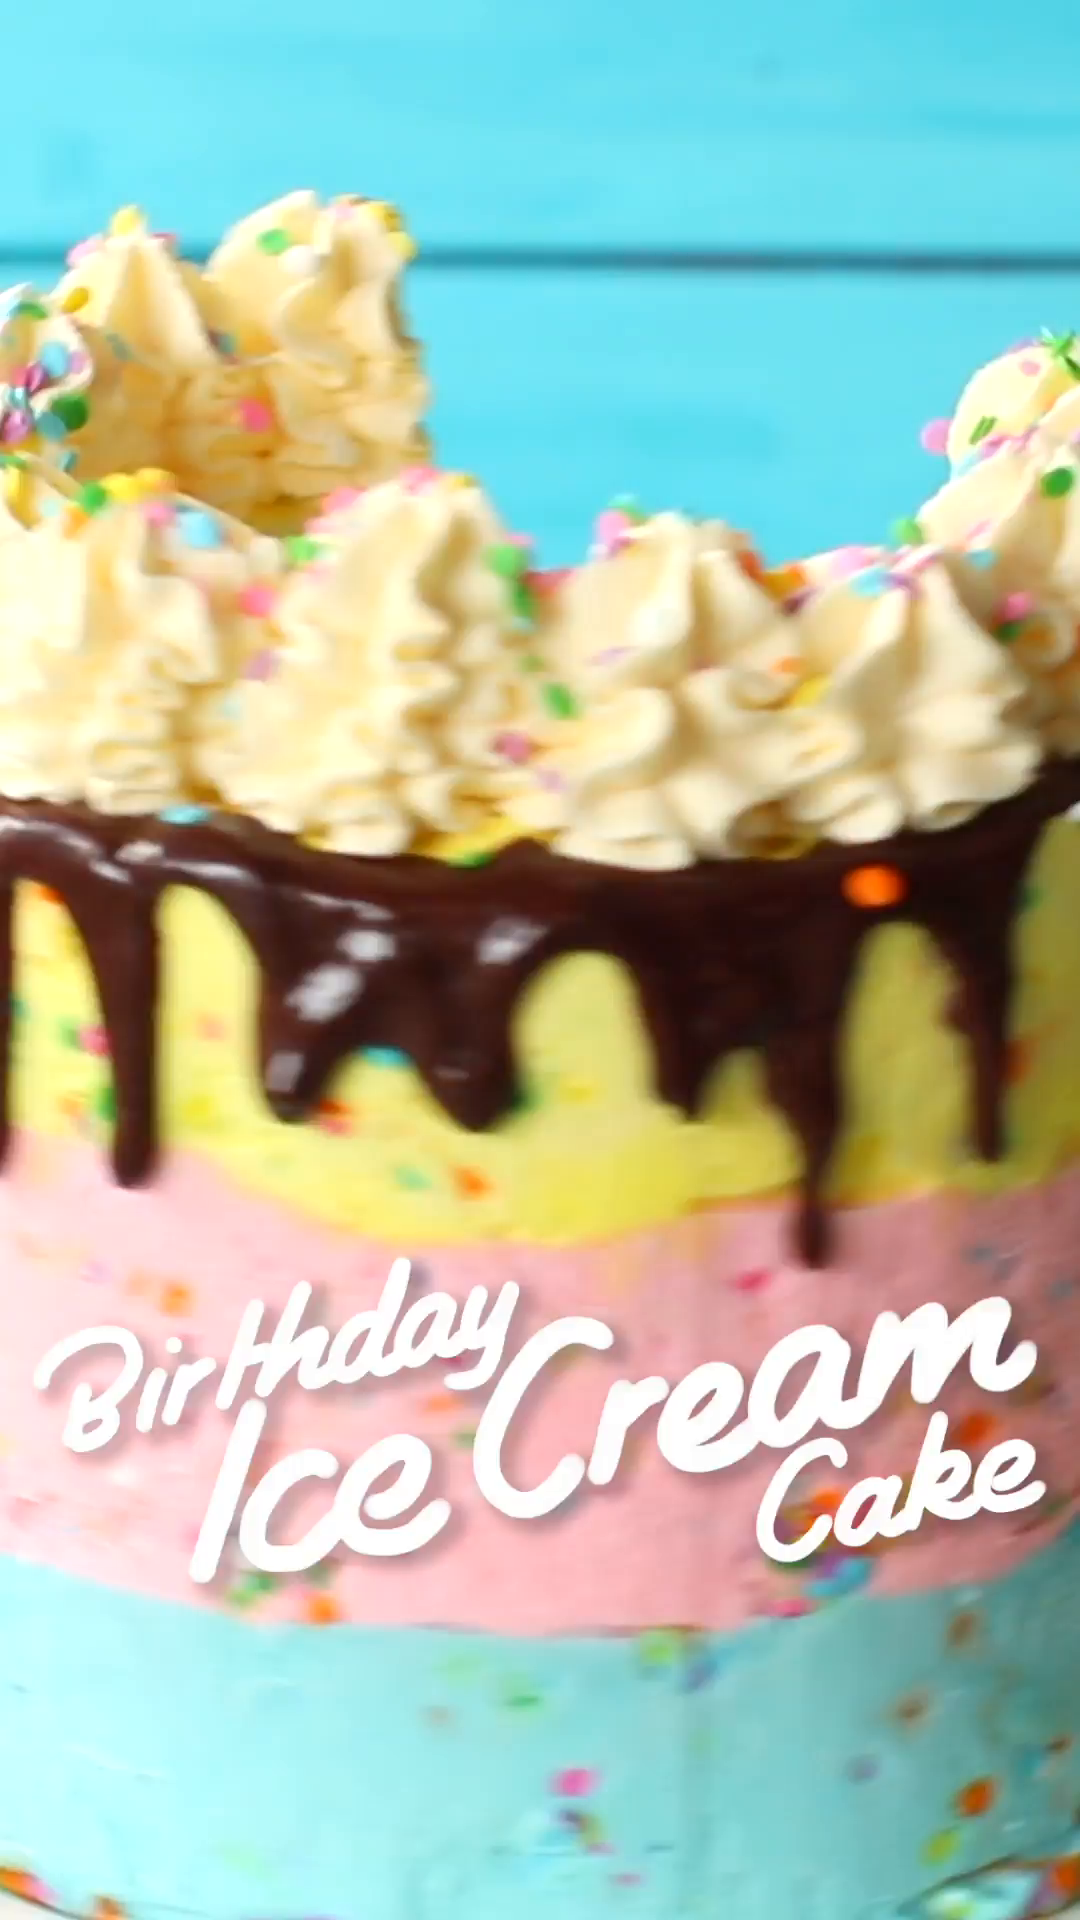 Ice Cream Birthday Cake The Scran Line